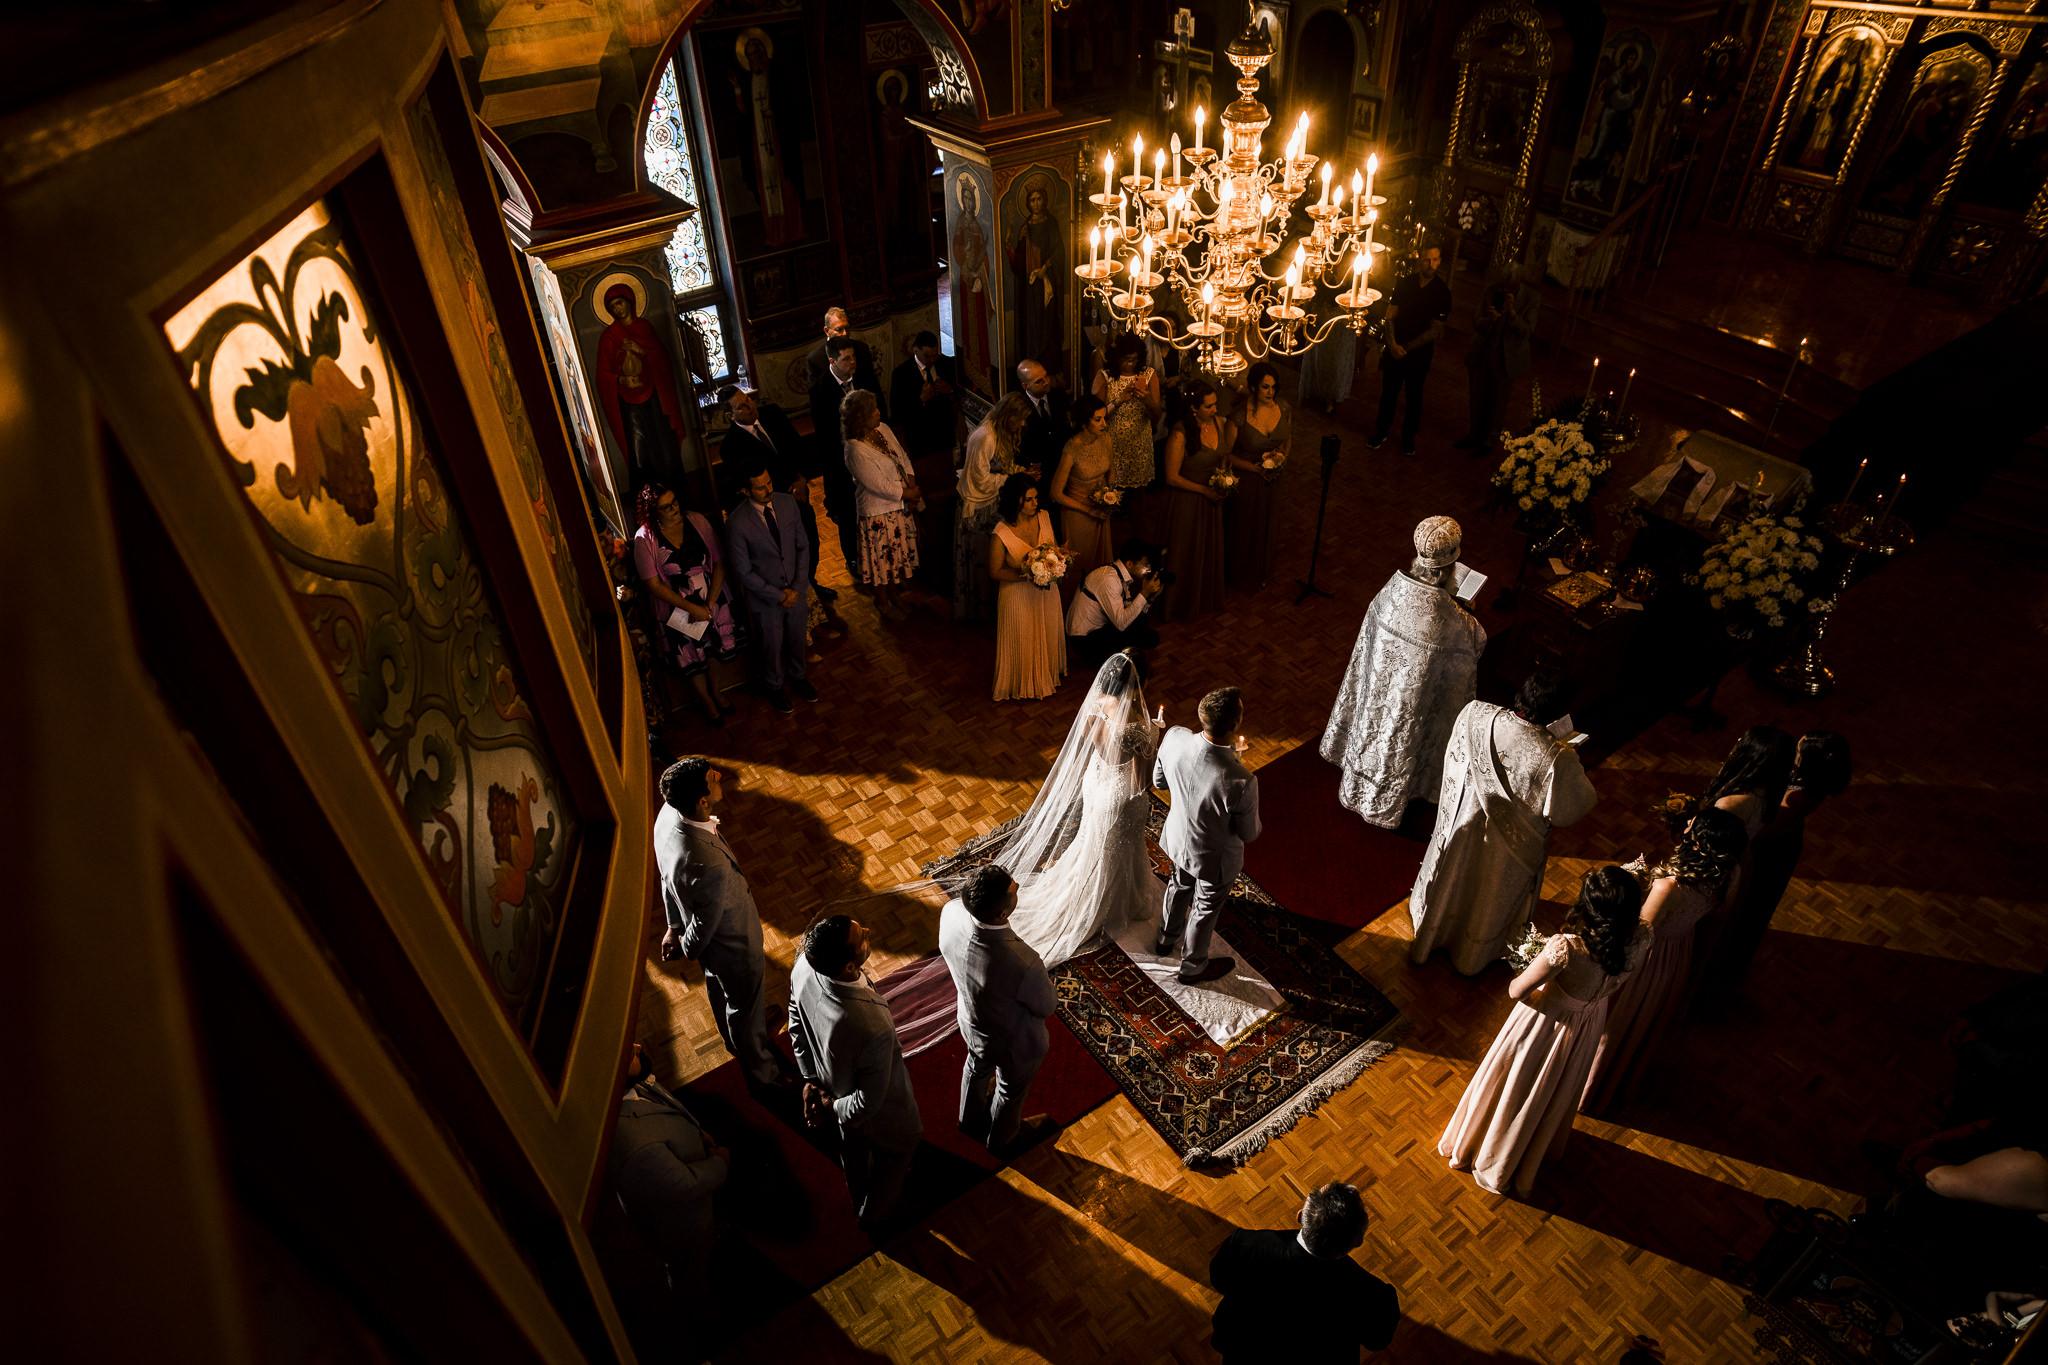 Barbato-Moorestown-Community-House-Wedding-New-Jersey-Photographer-09.JPG